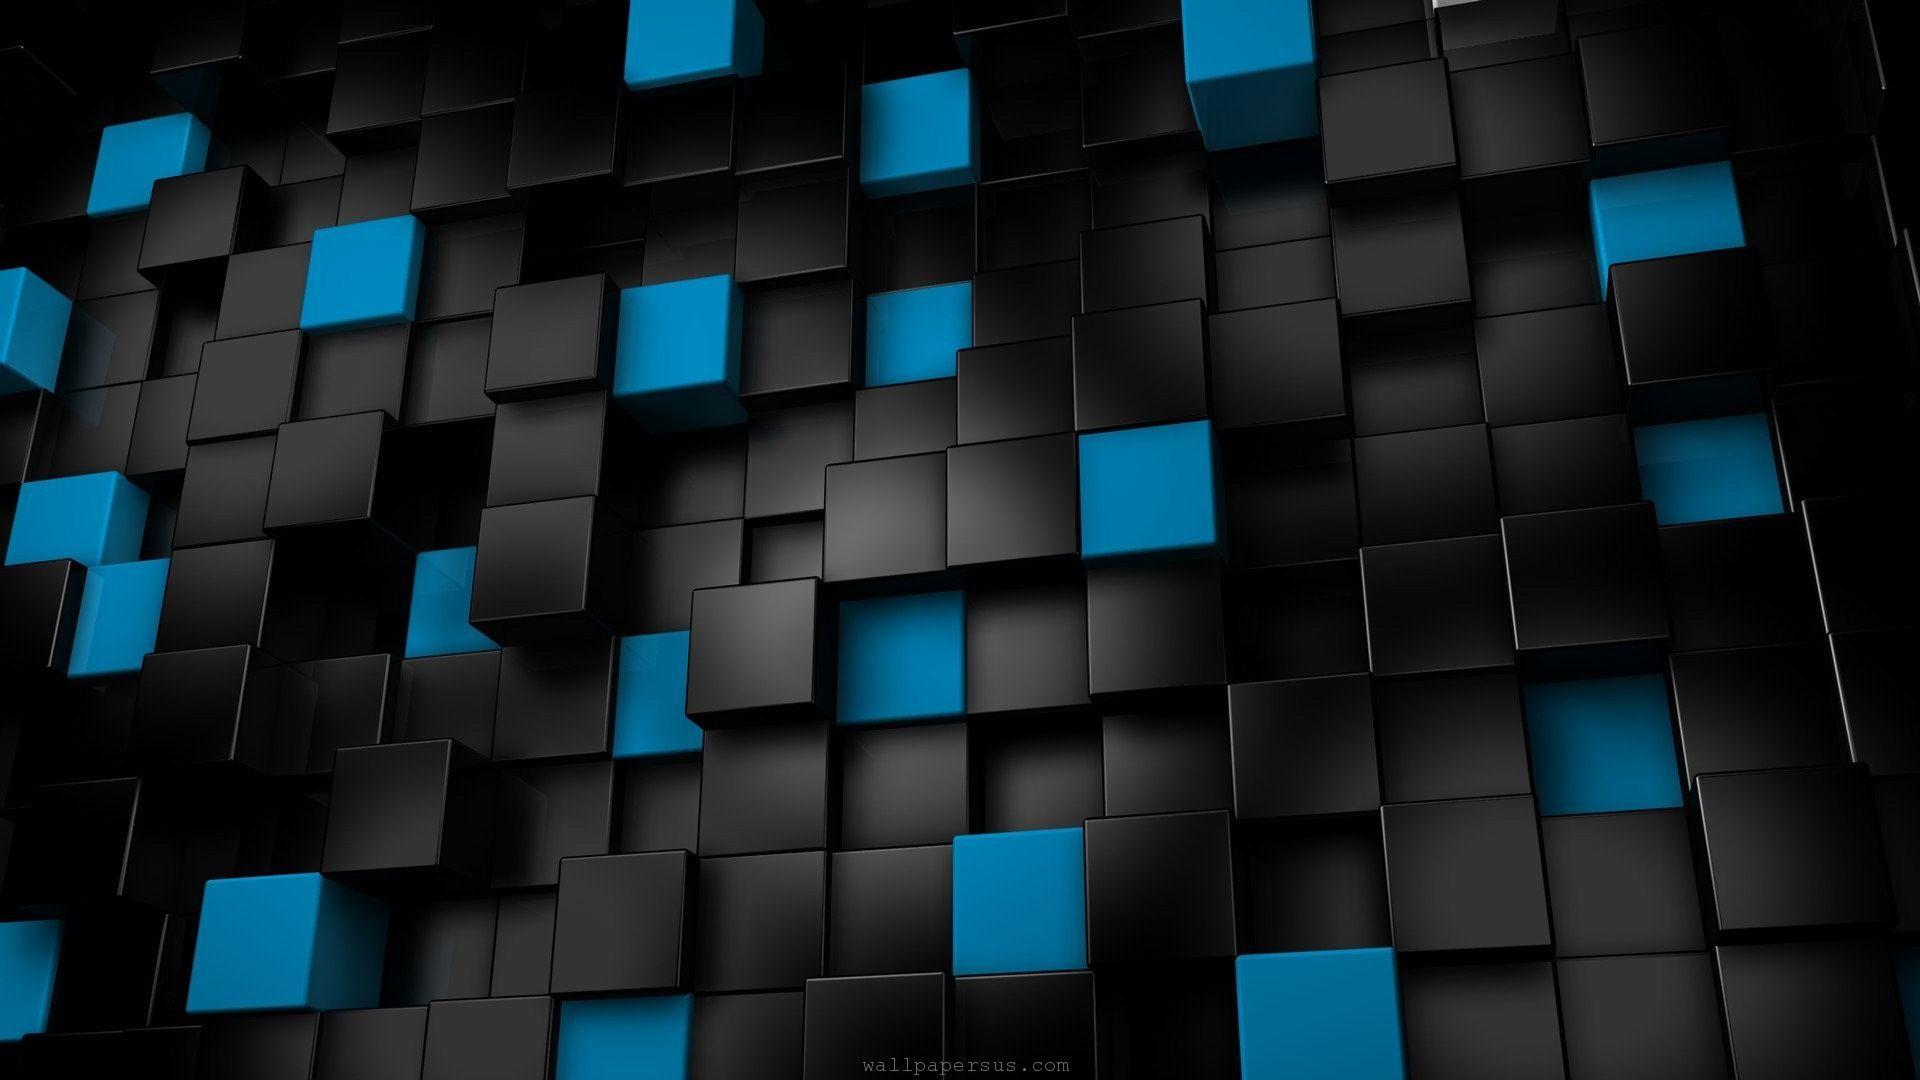 D background images - D Hd X Desktop Wallpapers